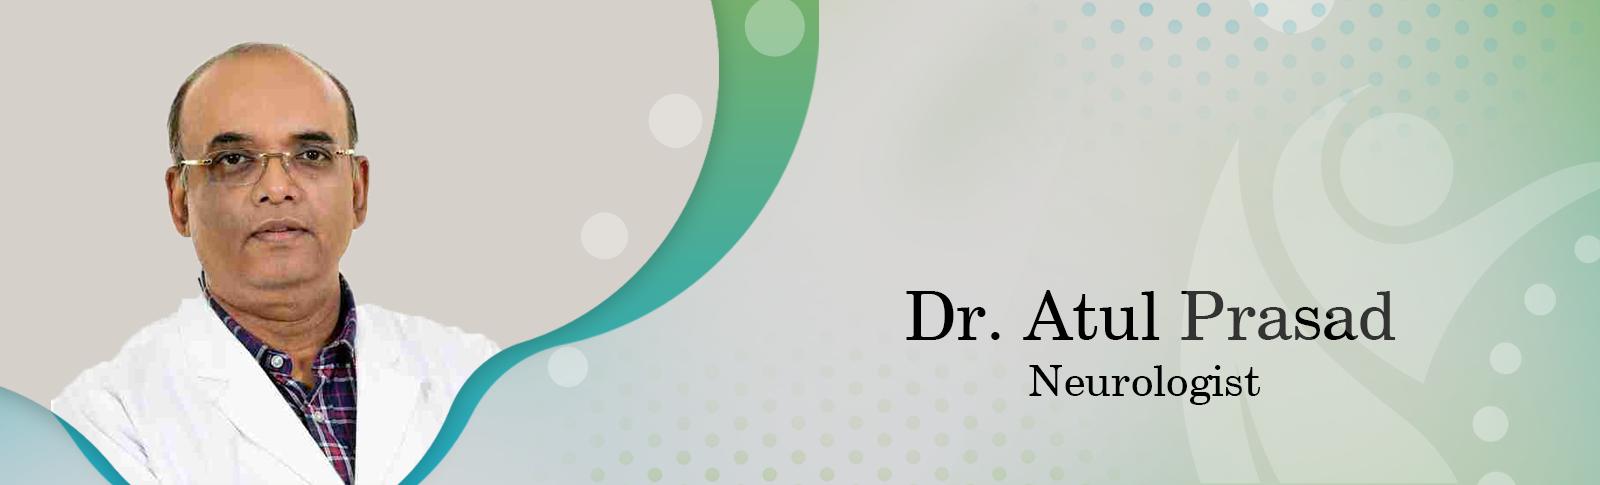 Dr. Atul Prasad